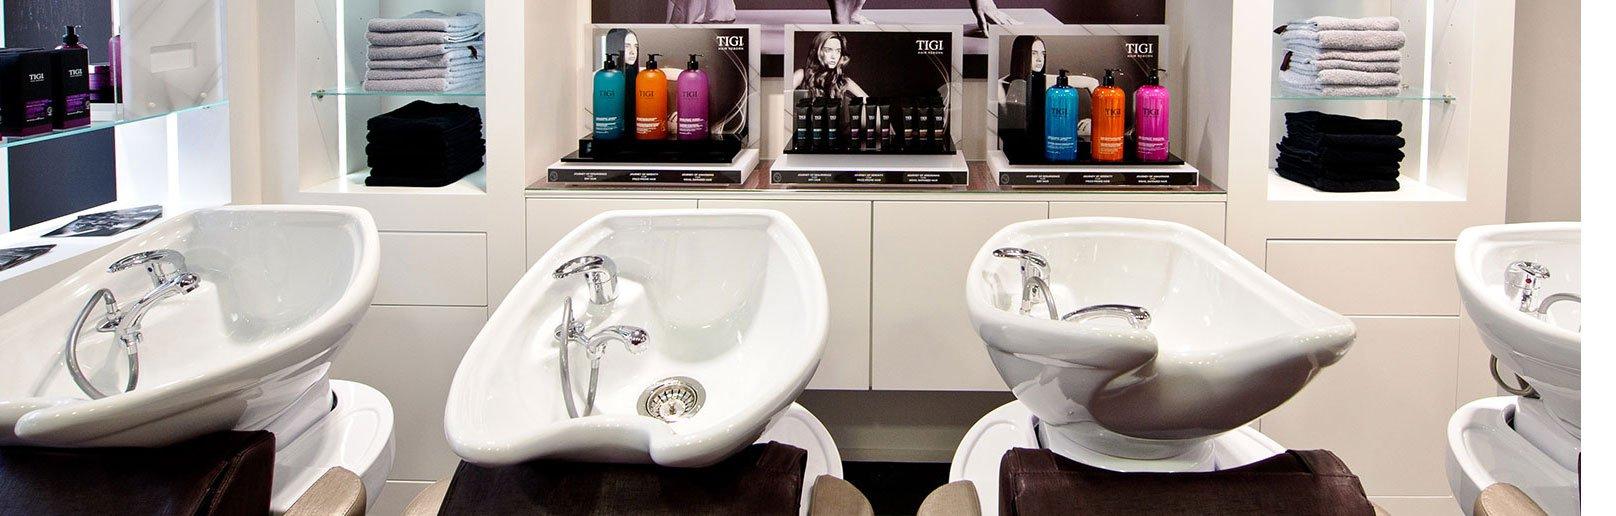 Pangbourne hair salon back wash luxury units